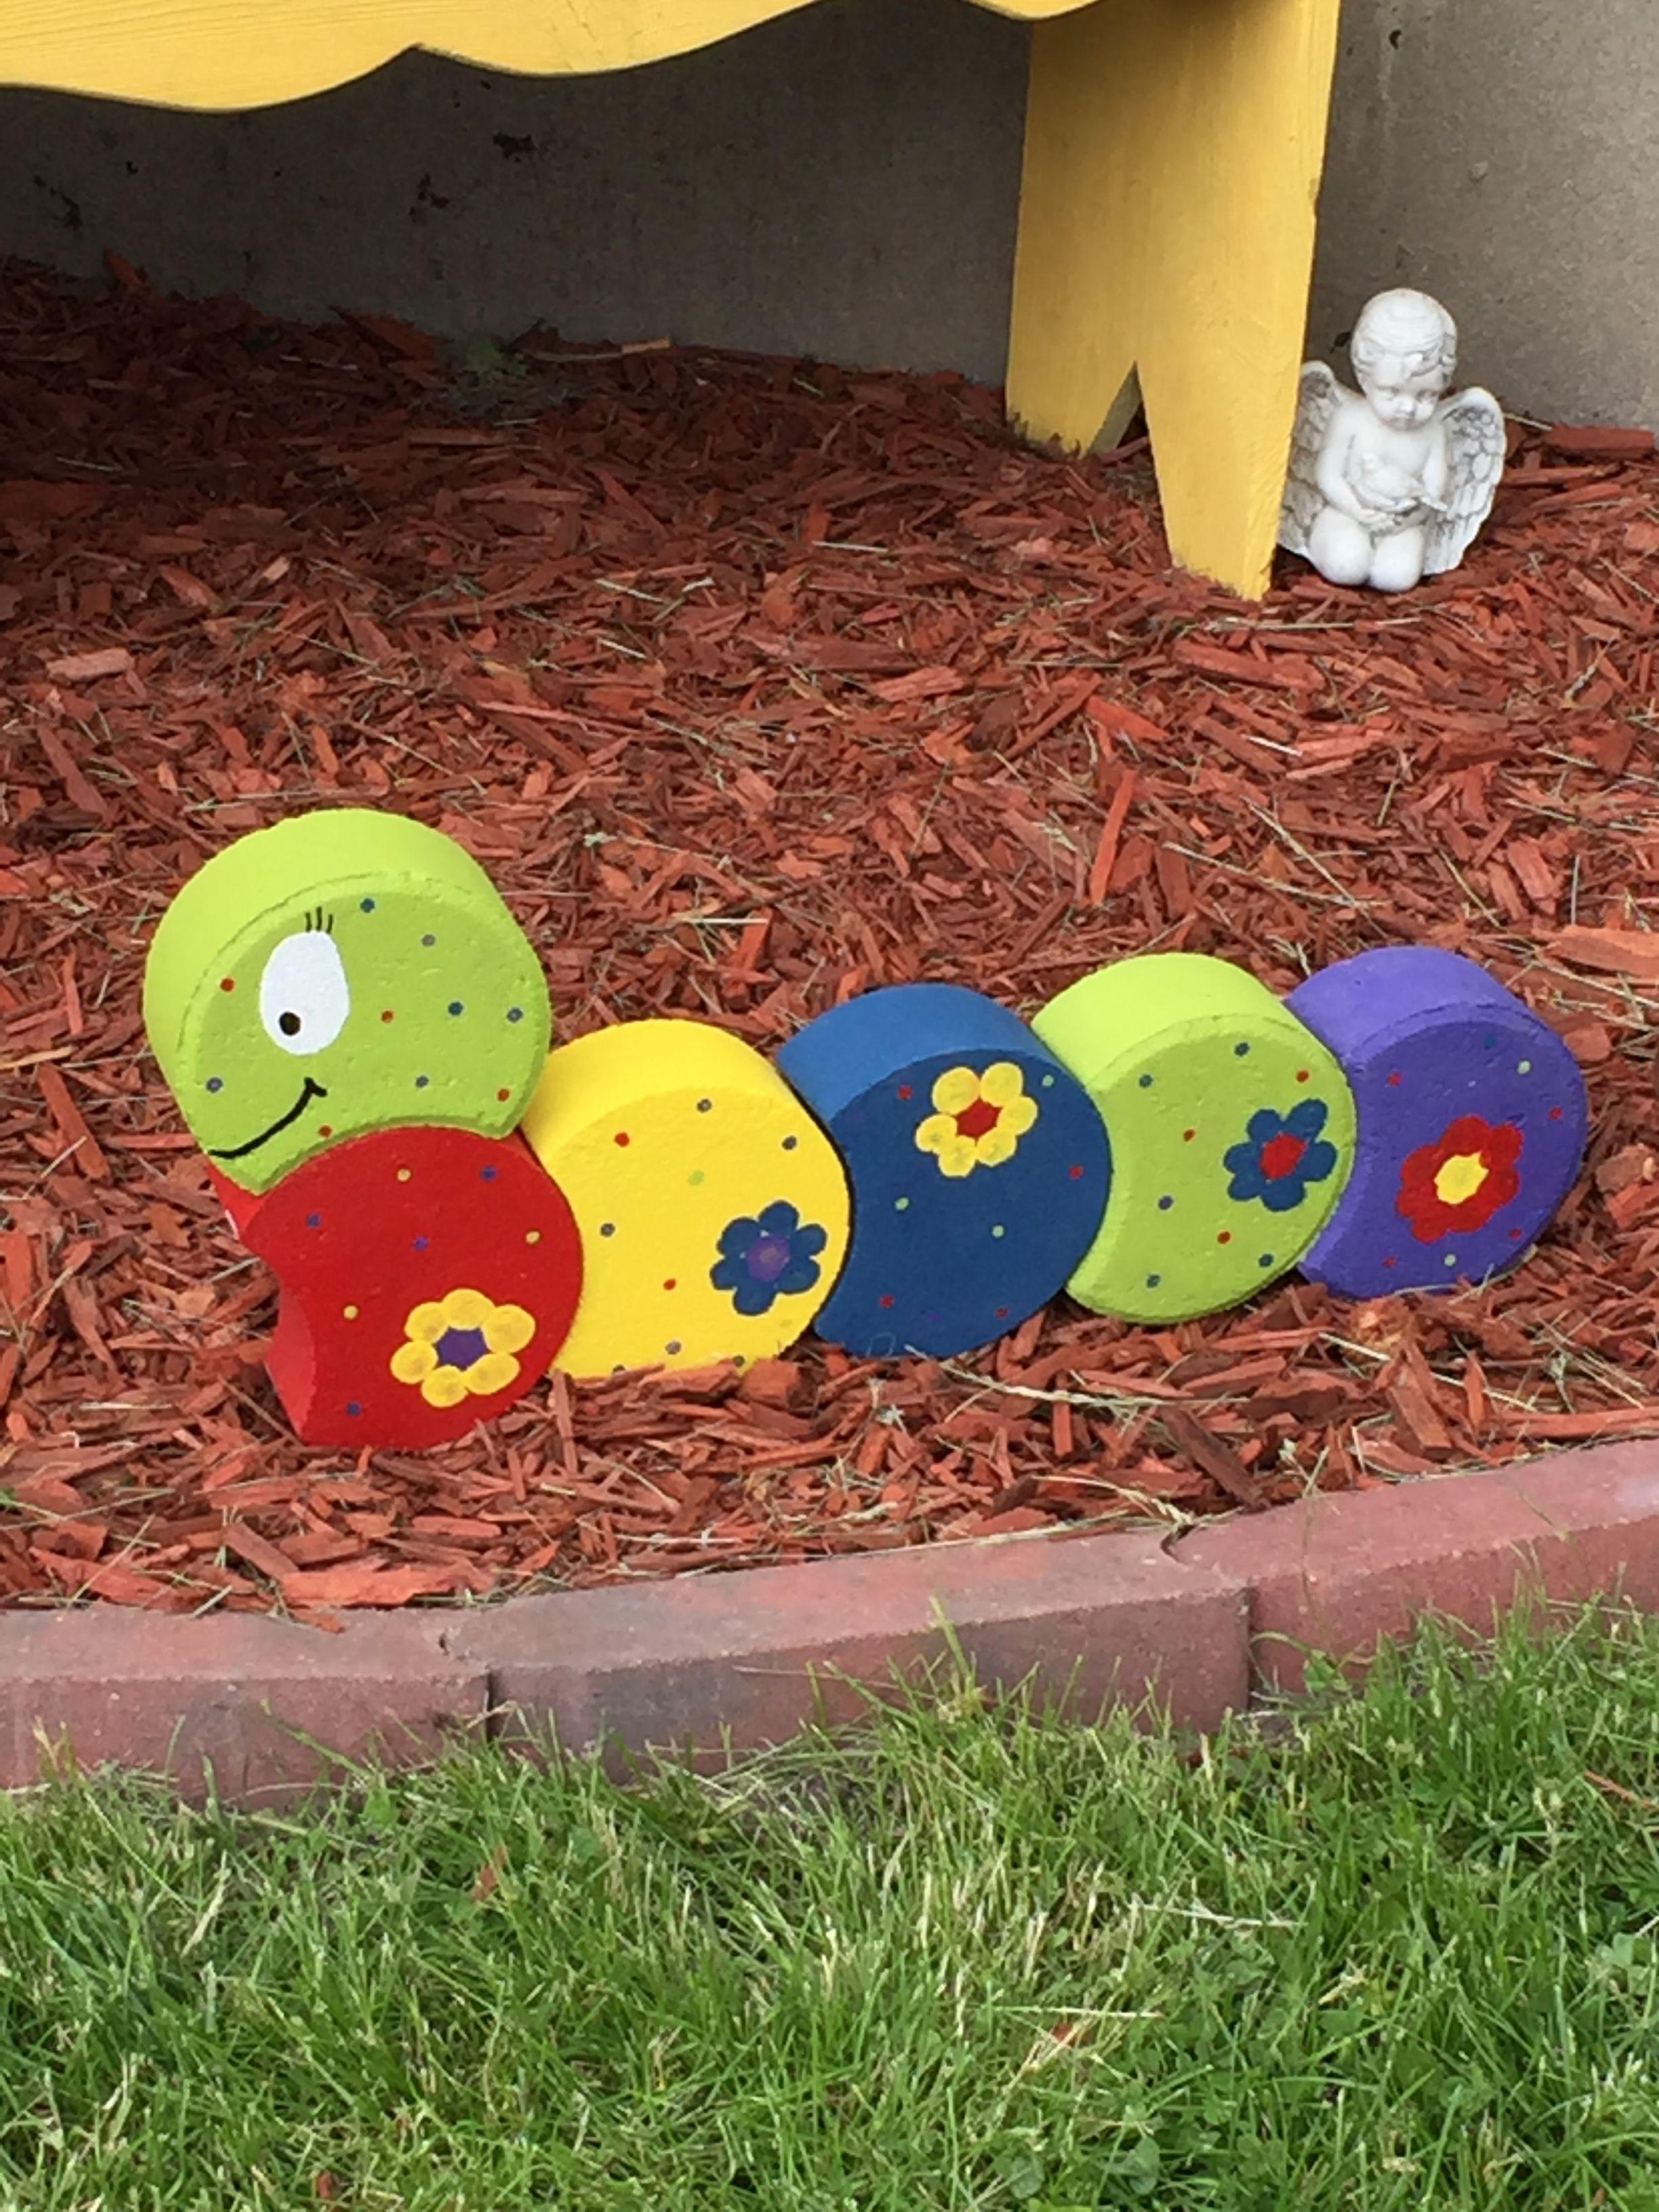 Paver Caterpillar Brick Crafts Painted Bricks Crafts